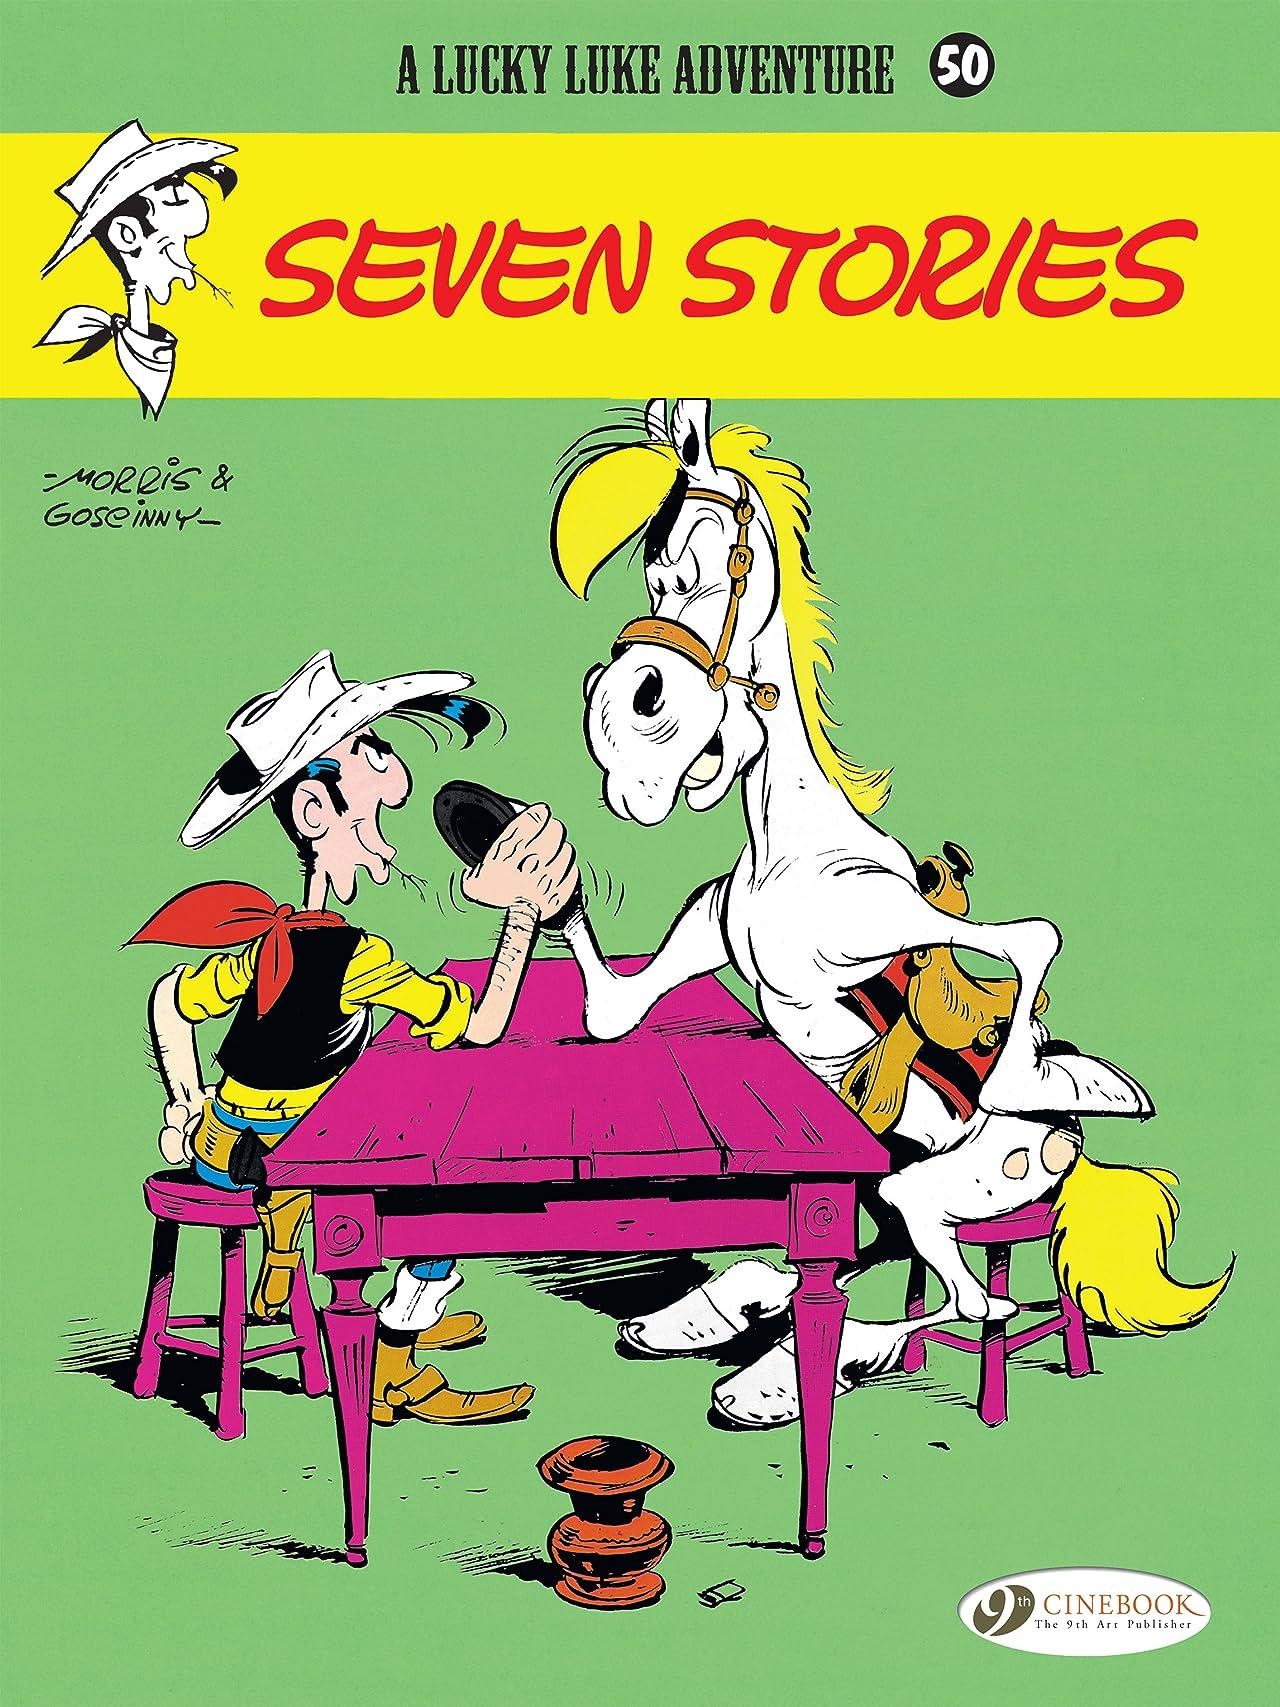 Lucky Luke Vol. 50: Seven stories